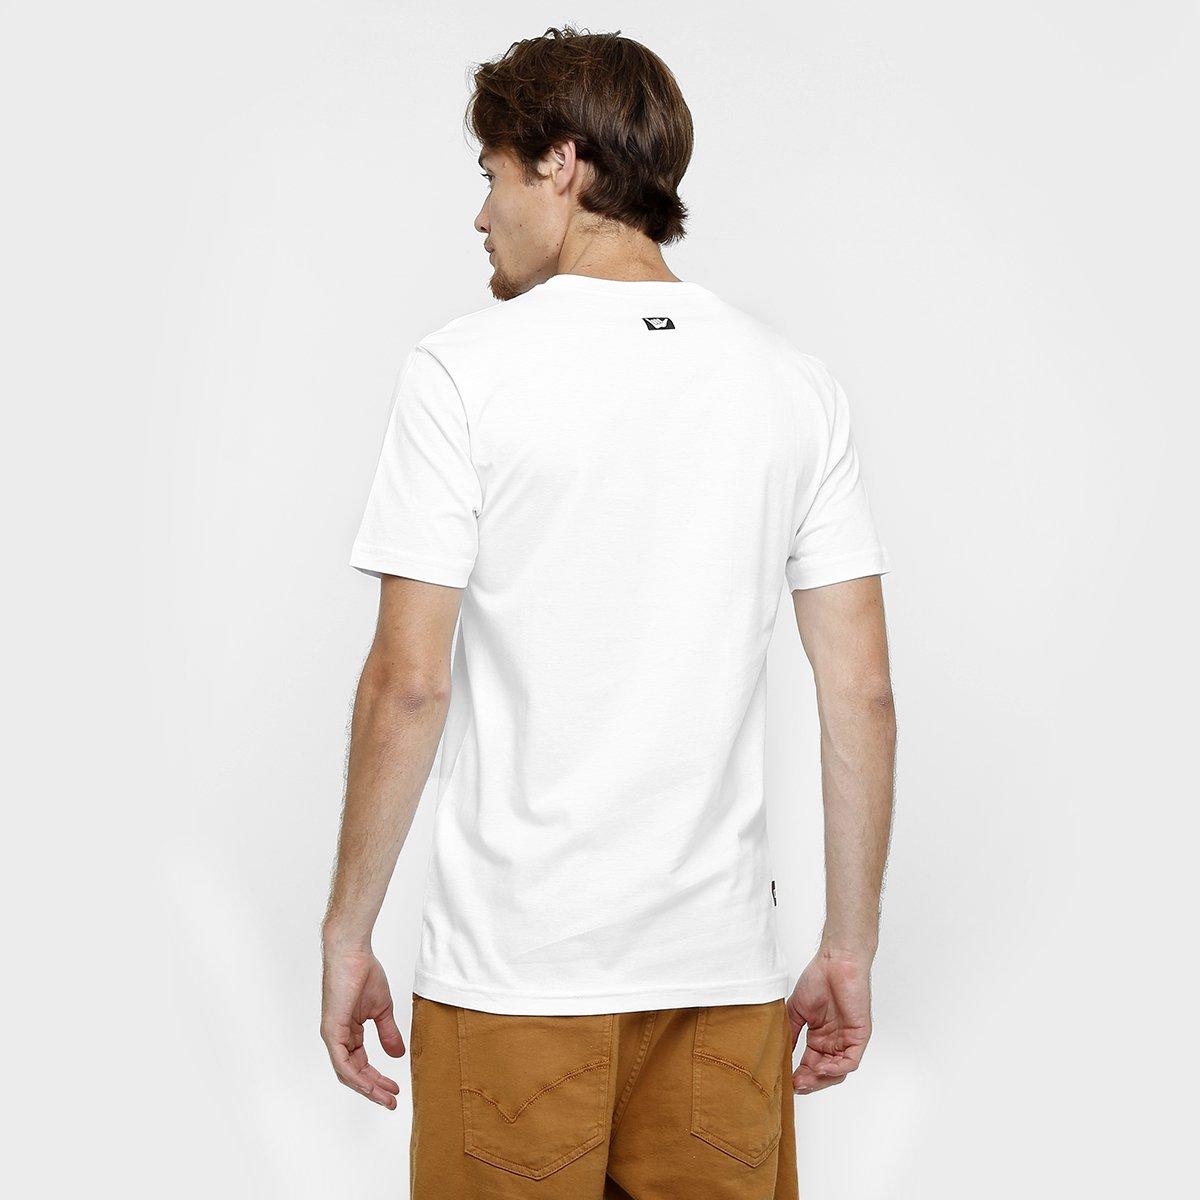 Camiseta Hang Loose Jamaica  Camiseta Hang Loose Jamaica ... 15bf3ec10caee